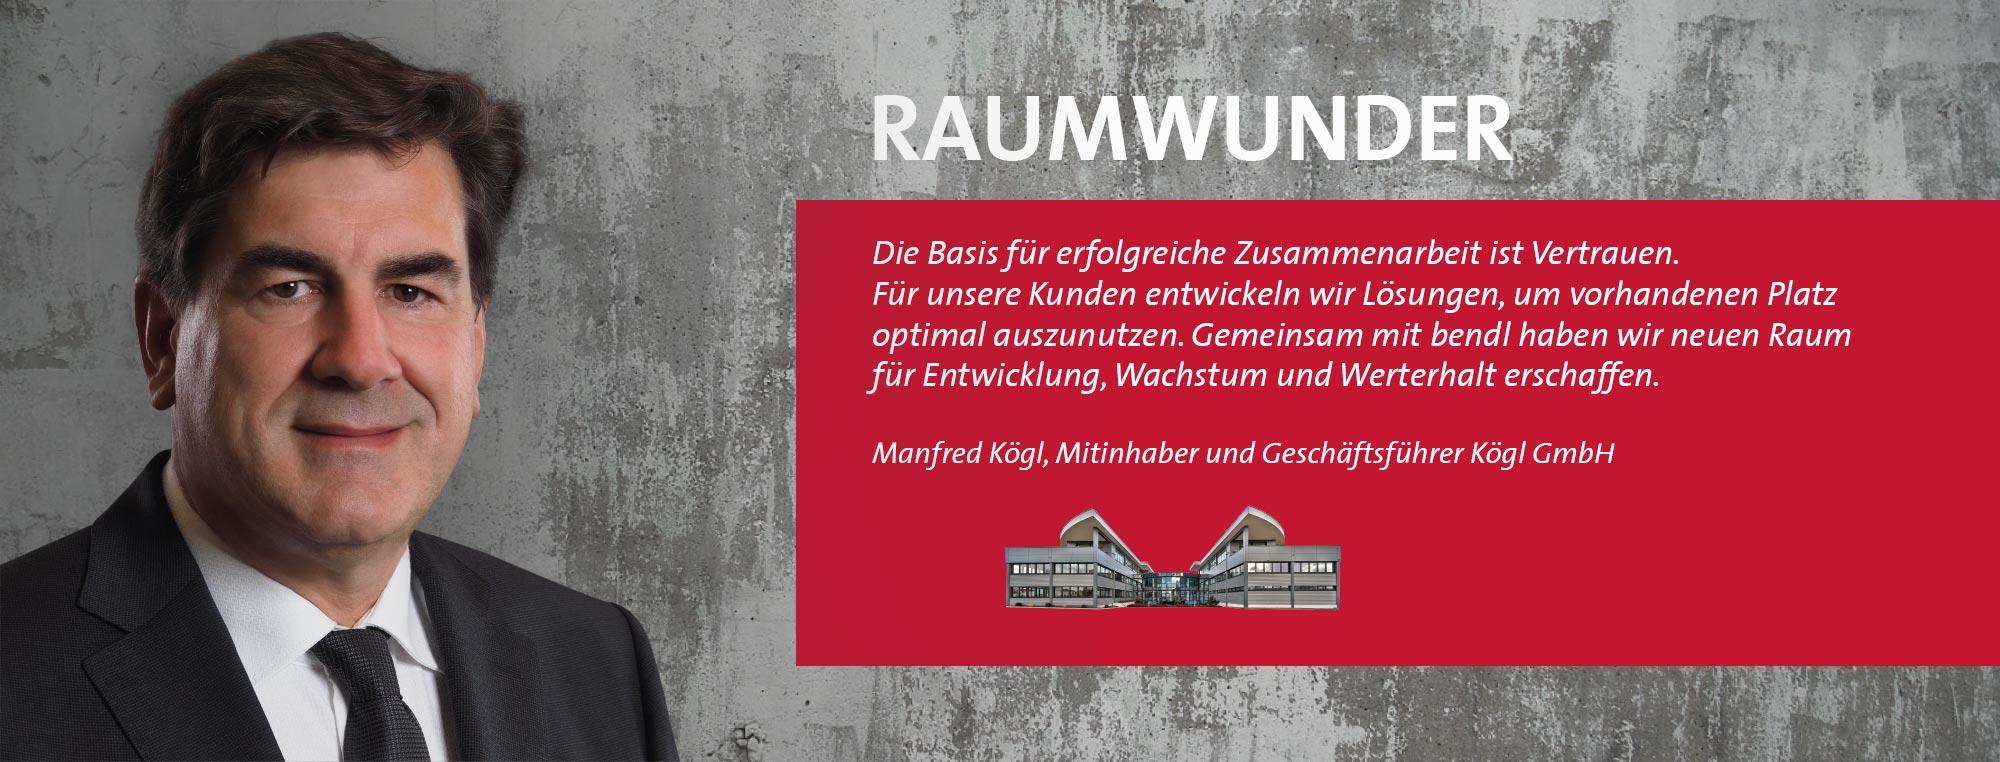 Manfred Kögl - Kögl GmbH